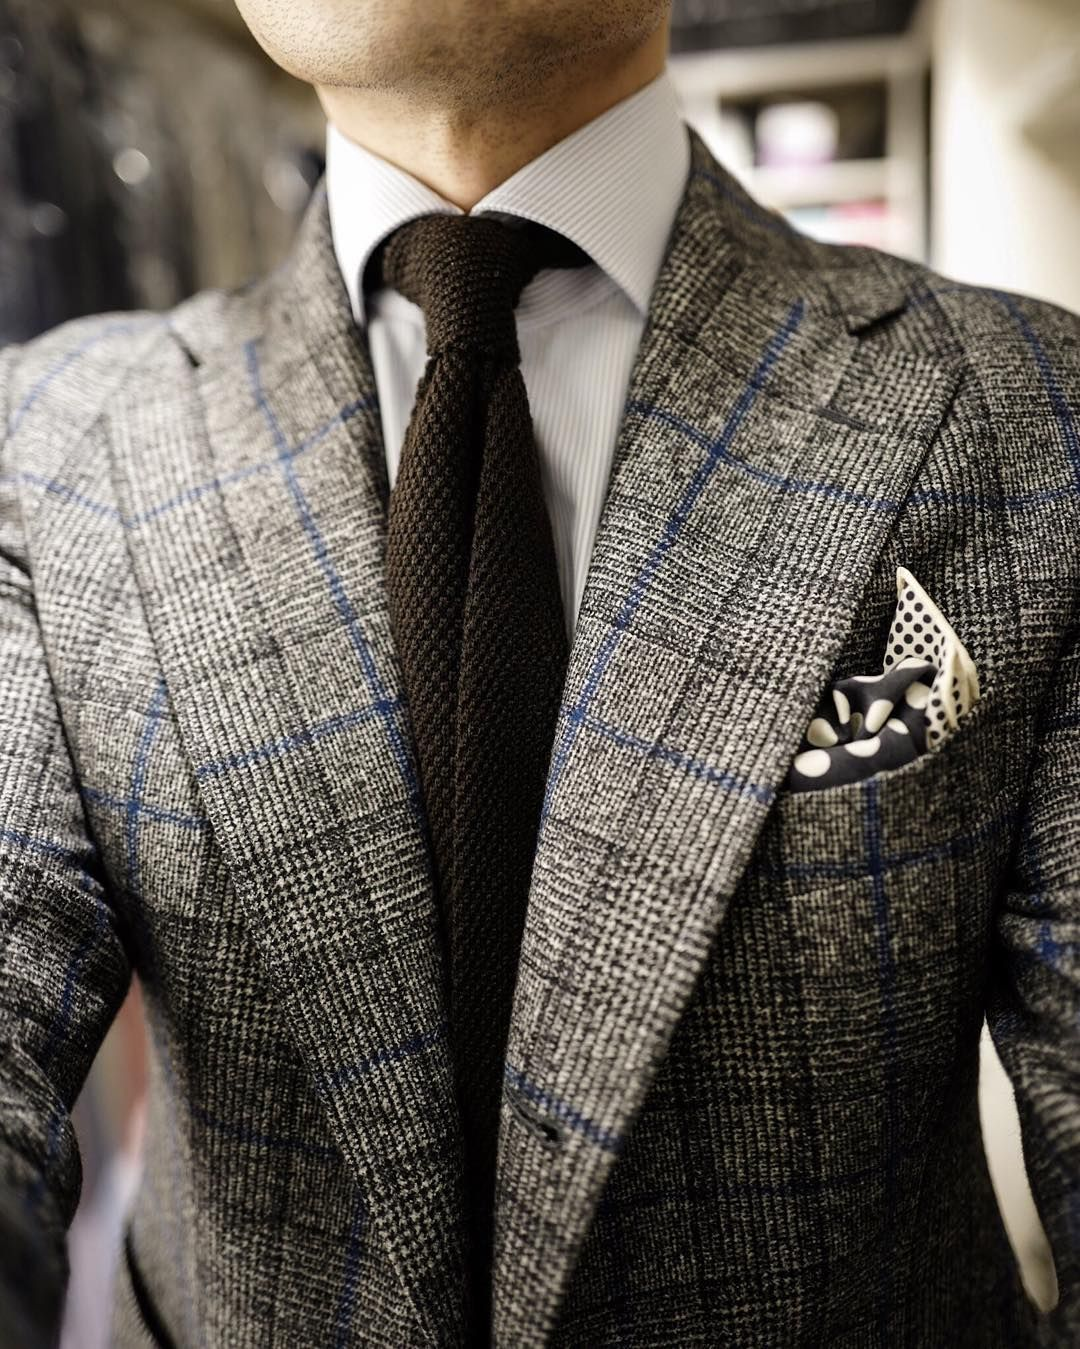 Bring back the Collar Pin | Neckwear fashion, Knit tie, Mens